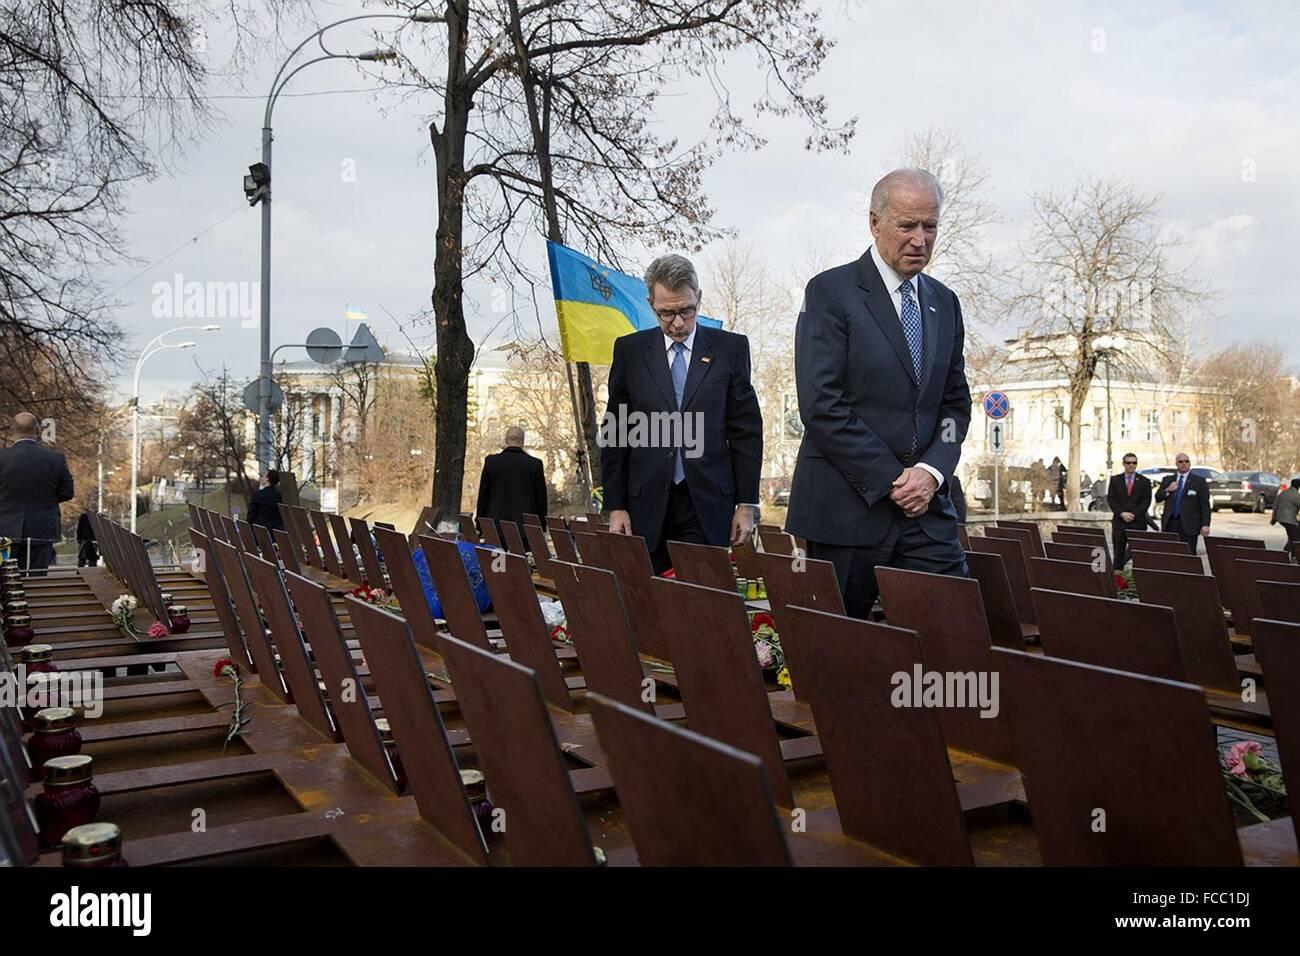 U.S Vice President Joe Biden and U.S. Ambassador Geoffrey Pyatt tour the Heavenly Hundred Memorial, an unofficial - Stock Image